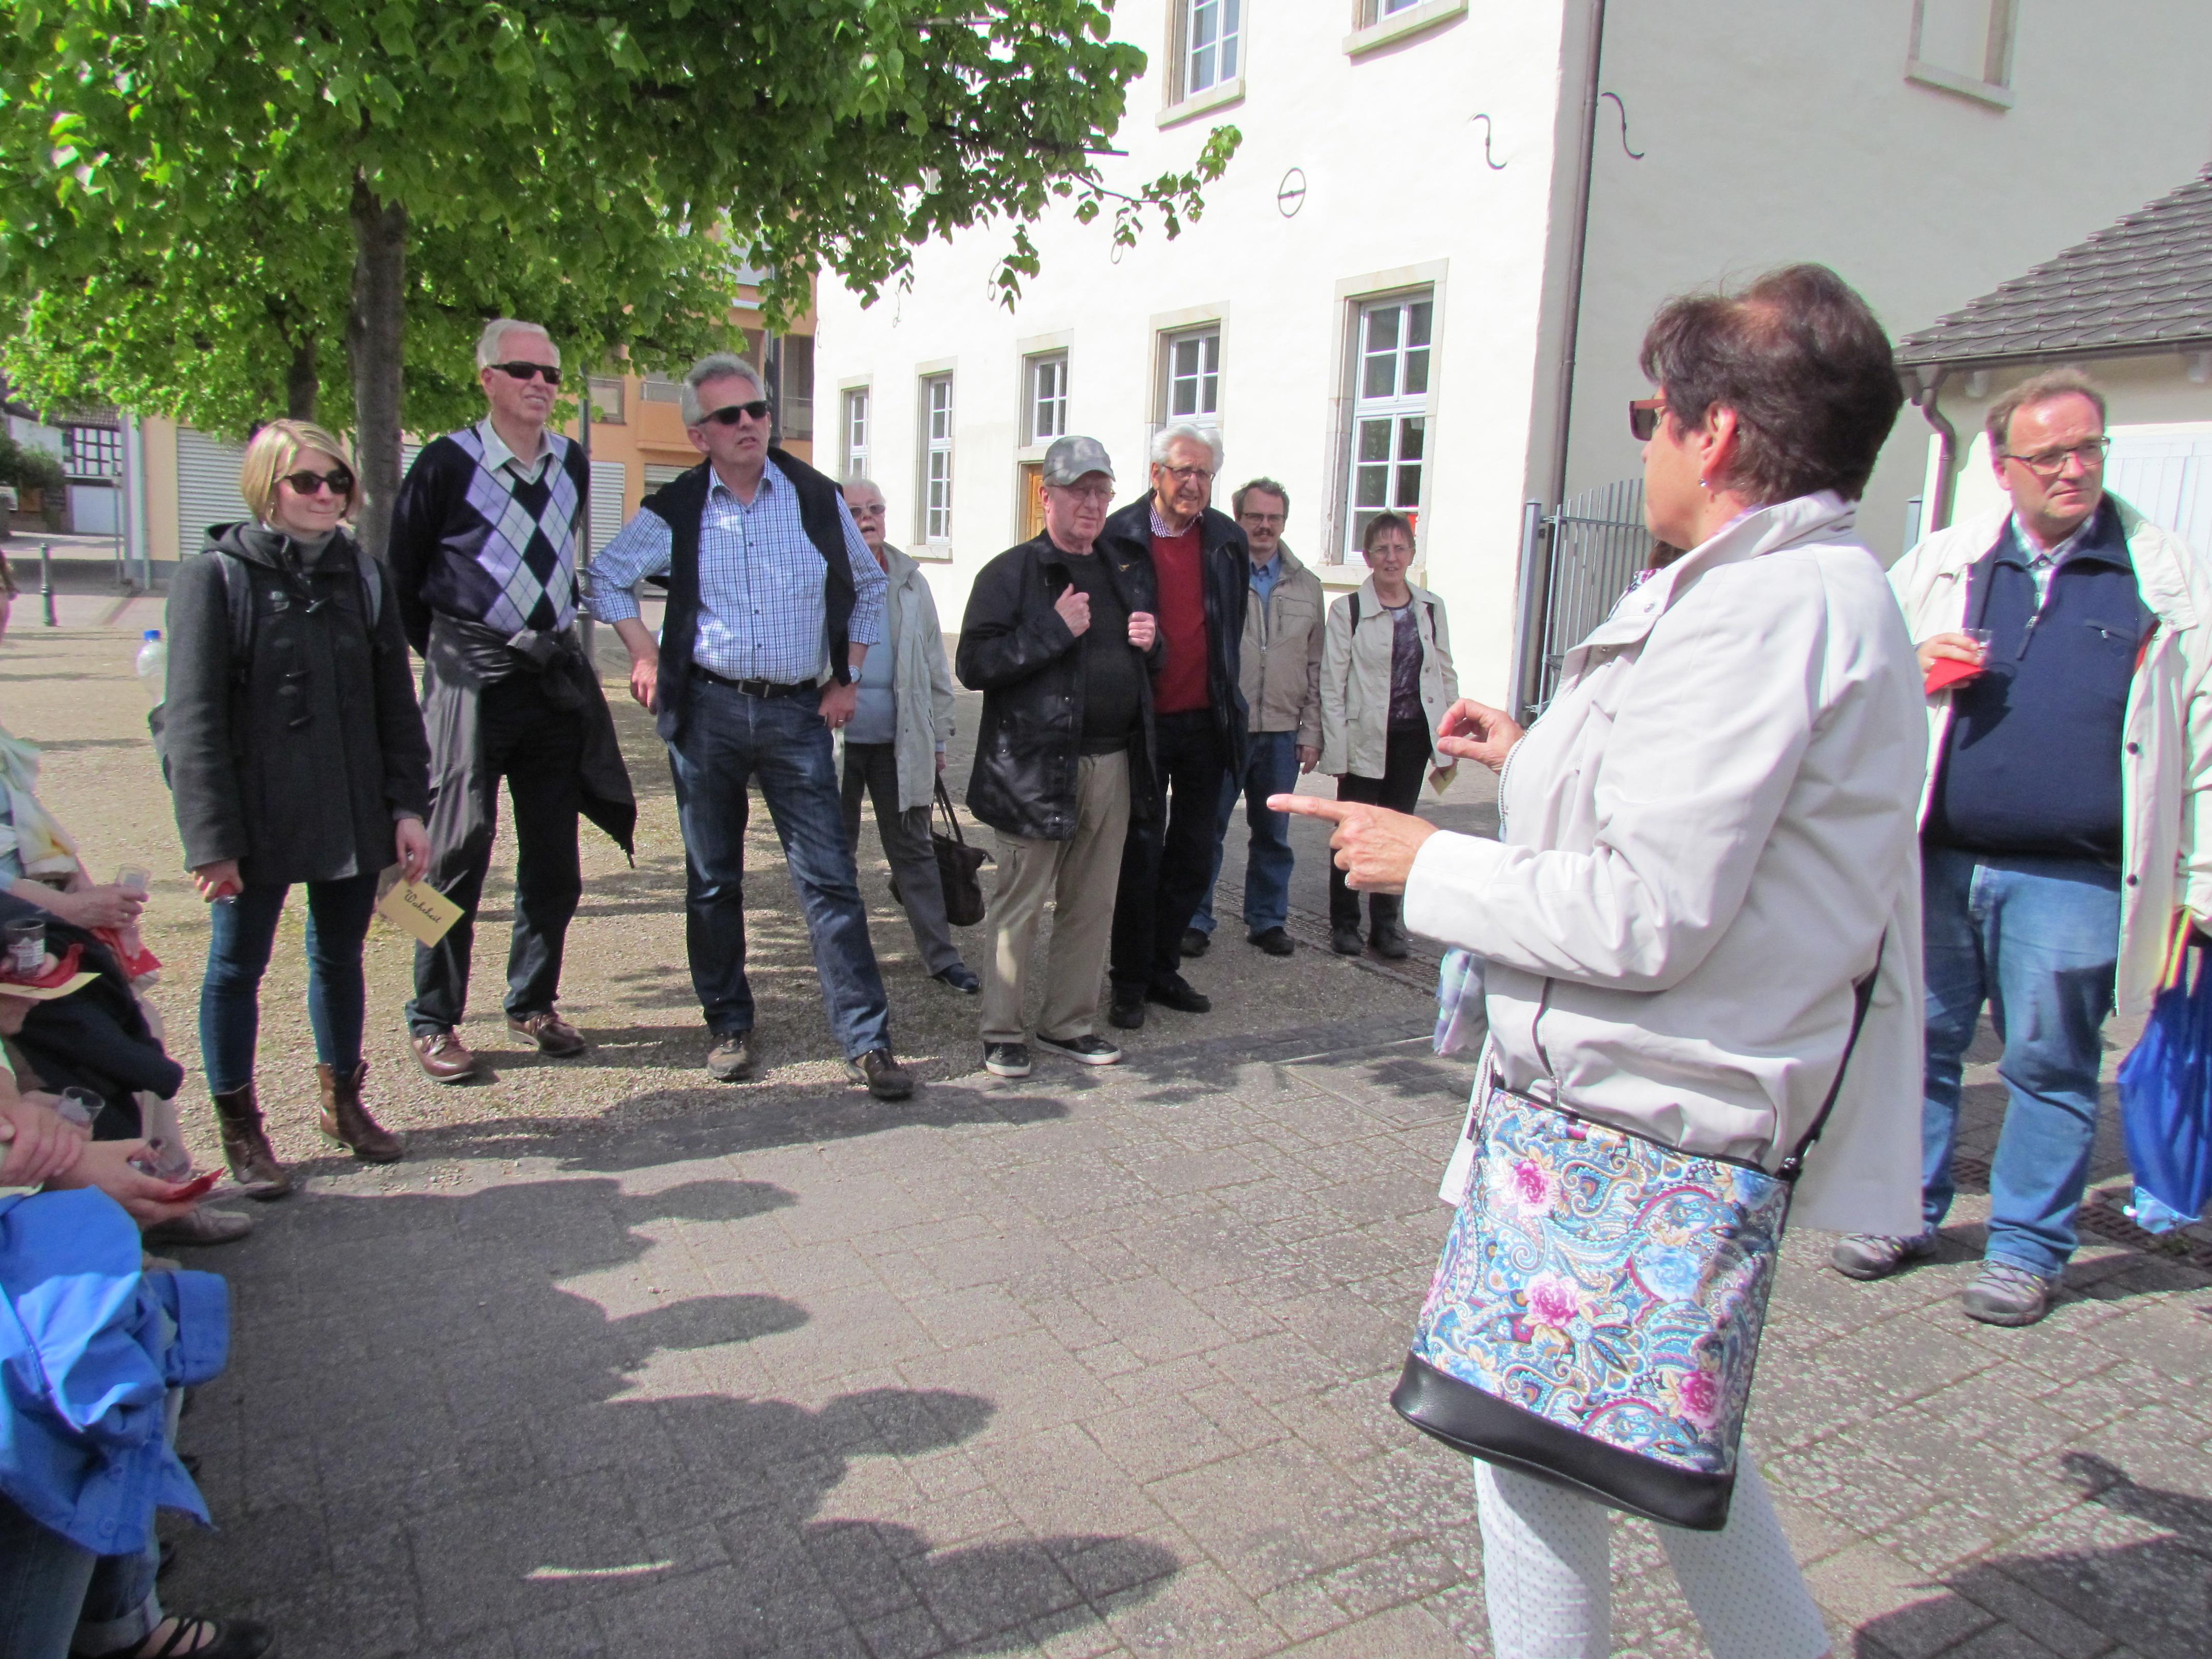 2017-05-Mai-06-Chorausflug-Ahrweiler_Bernd-Finken_039